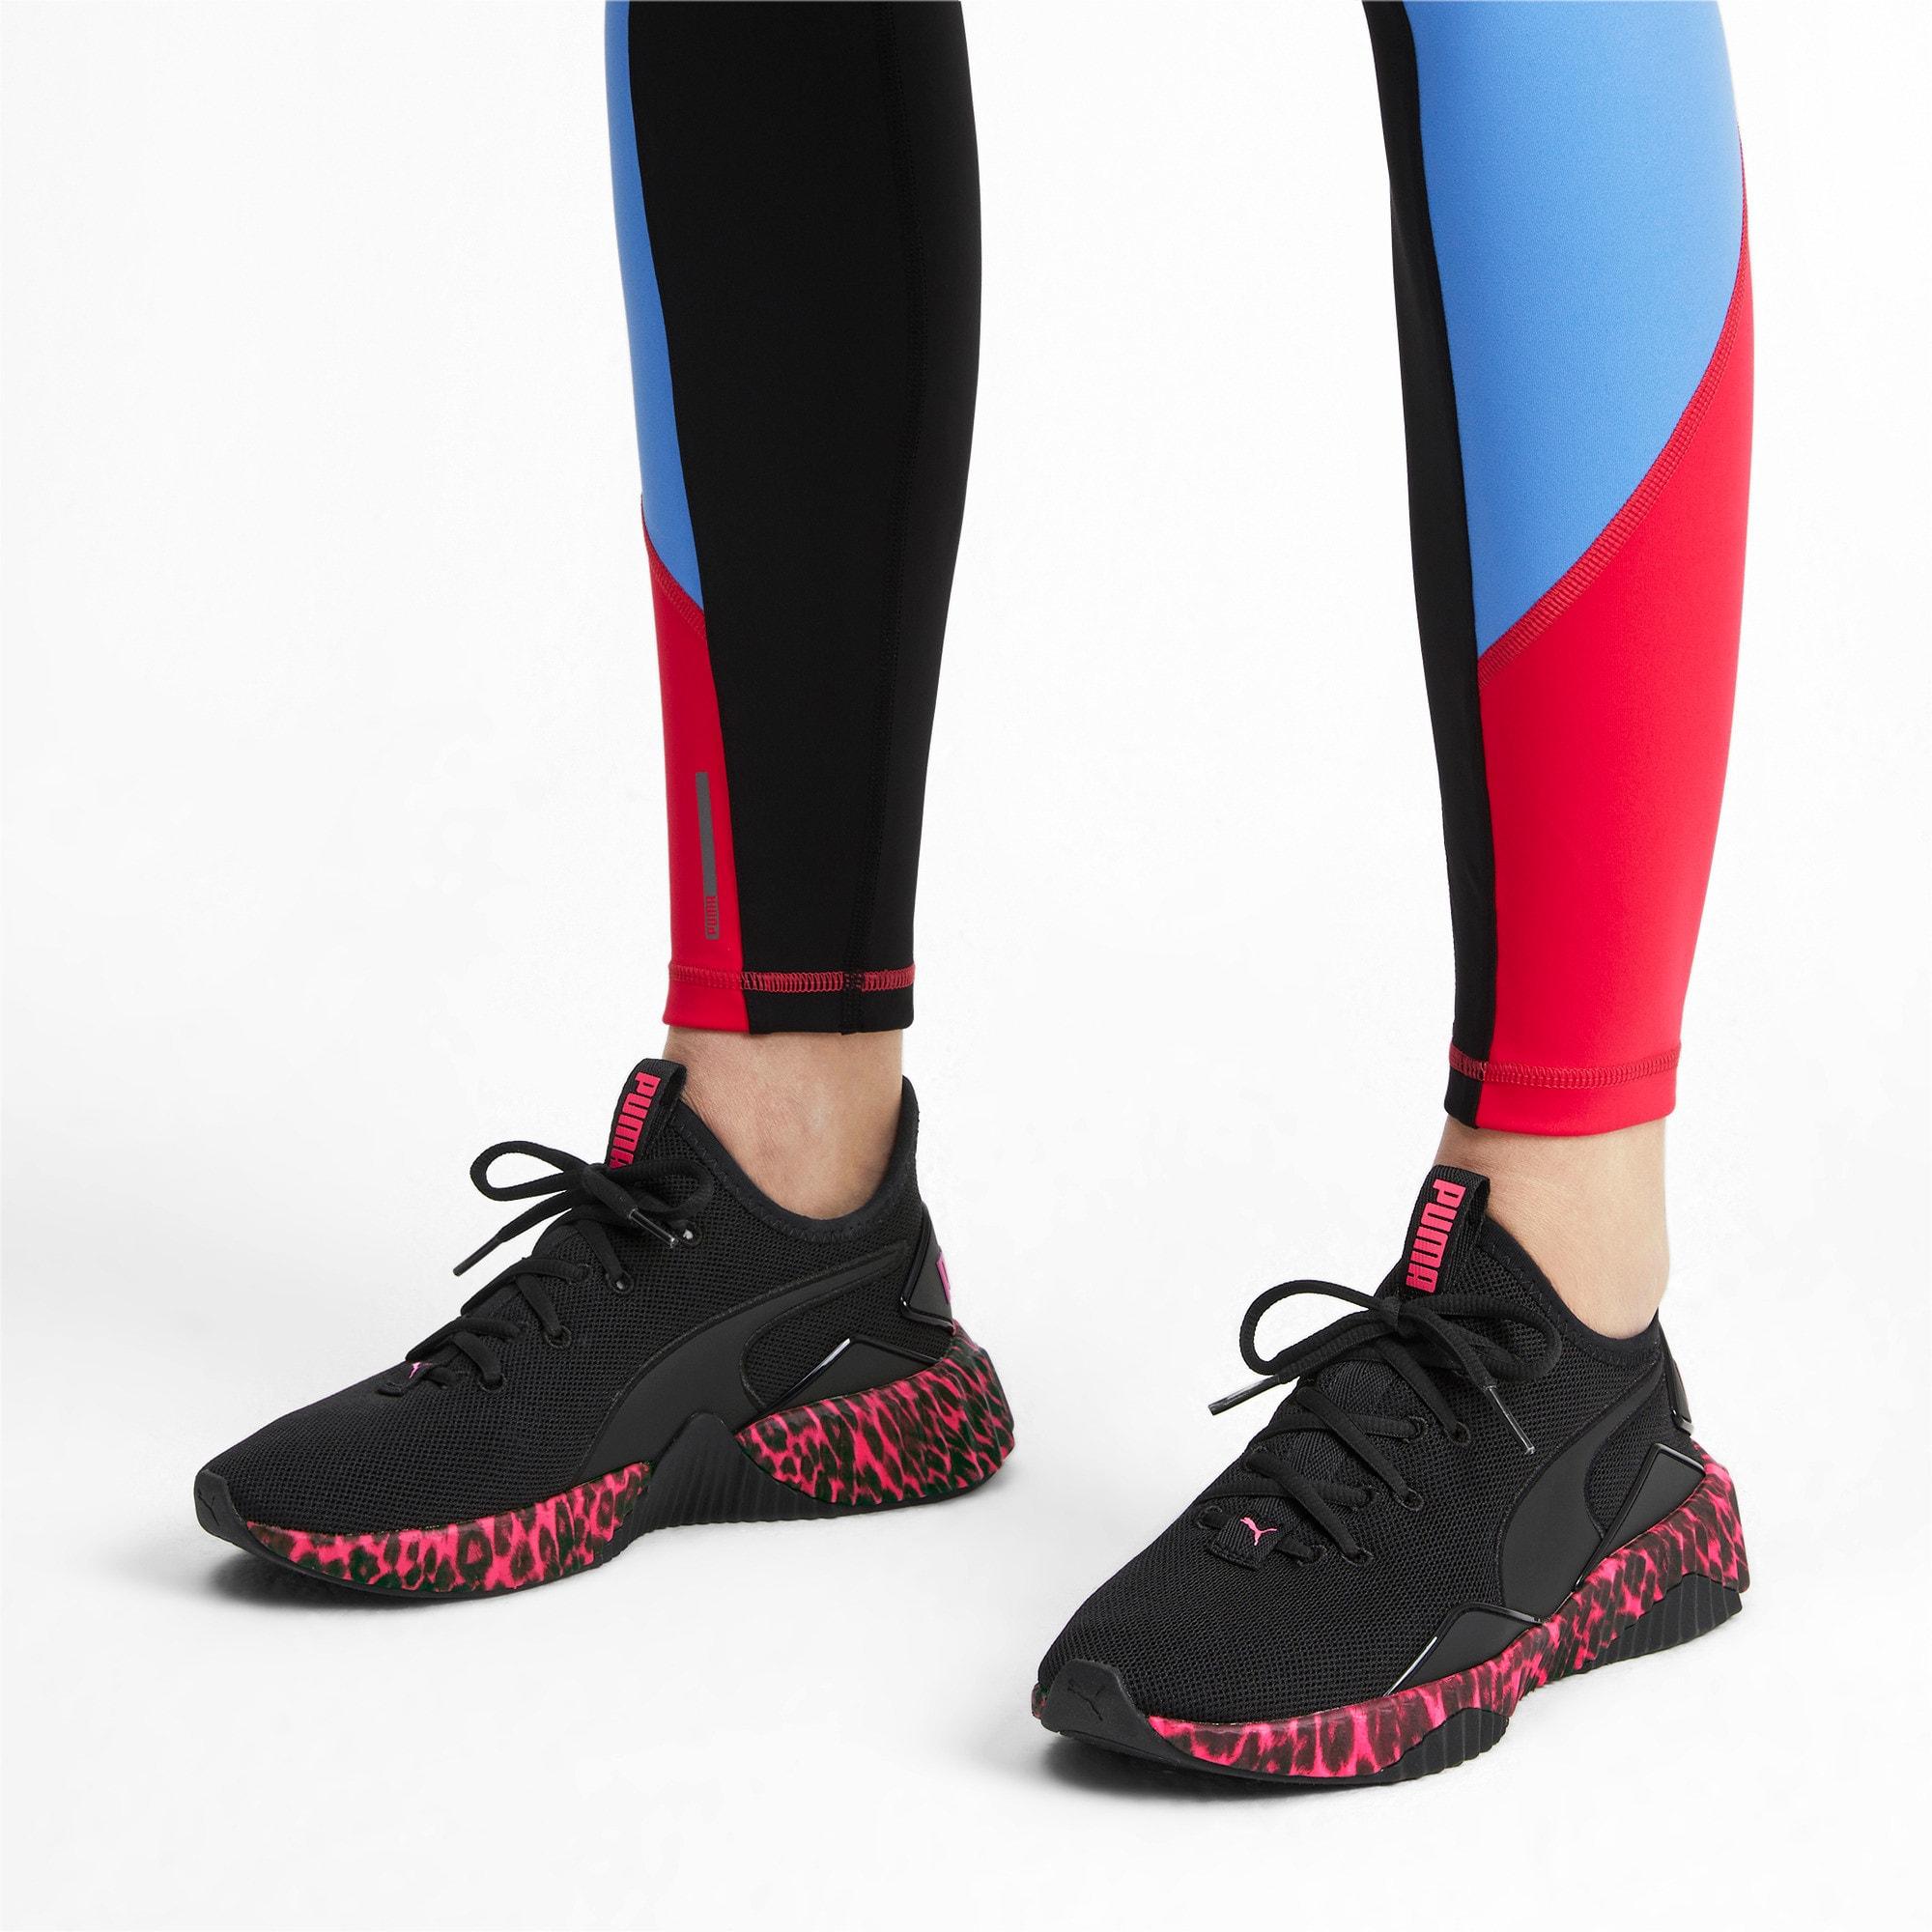 Thumbnail 3 of Defy Leopard Women's Sneakers, Puma Black-Pink Alert, medium